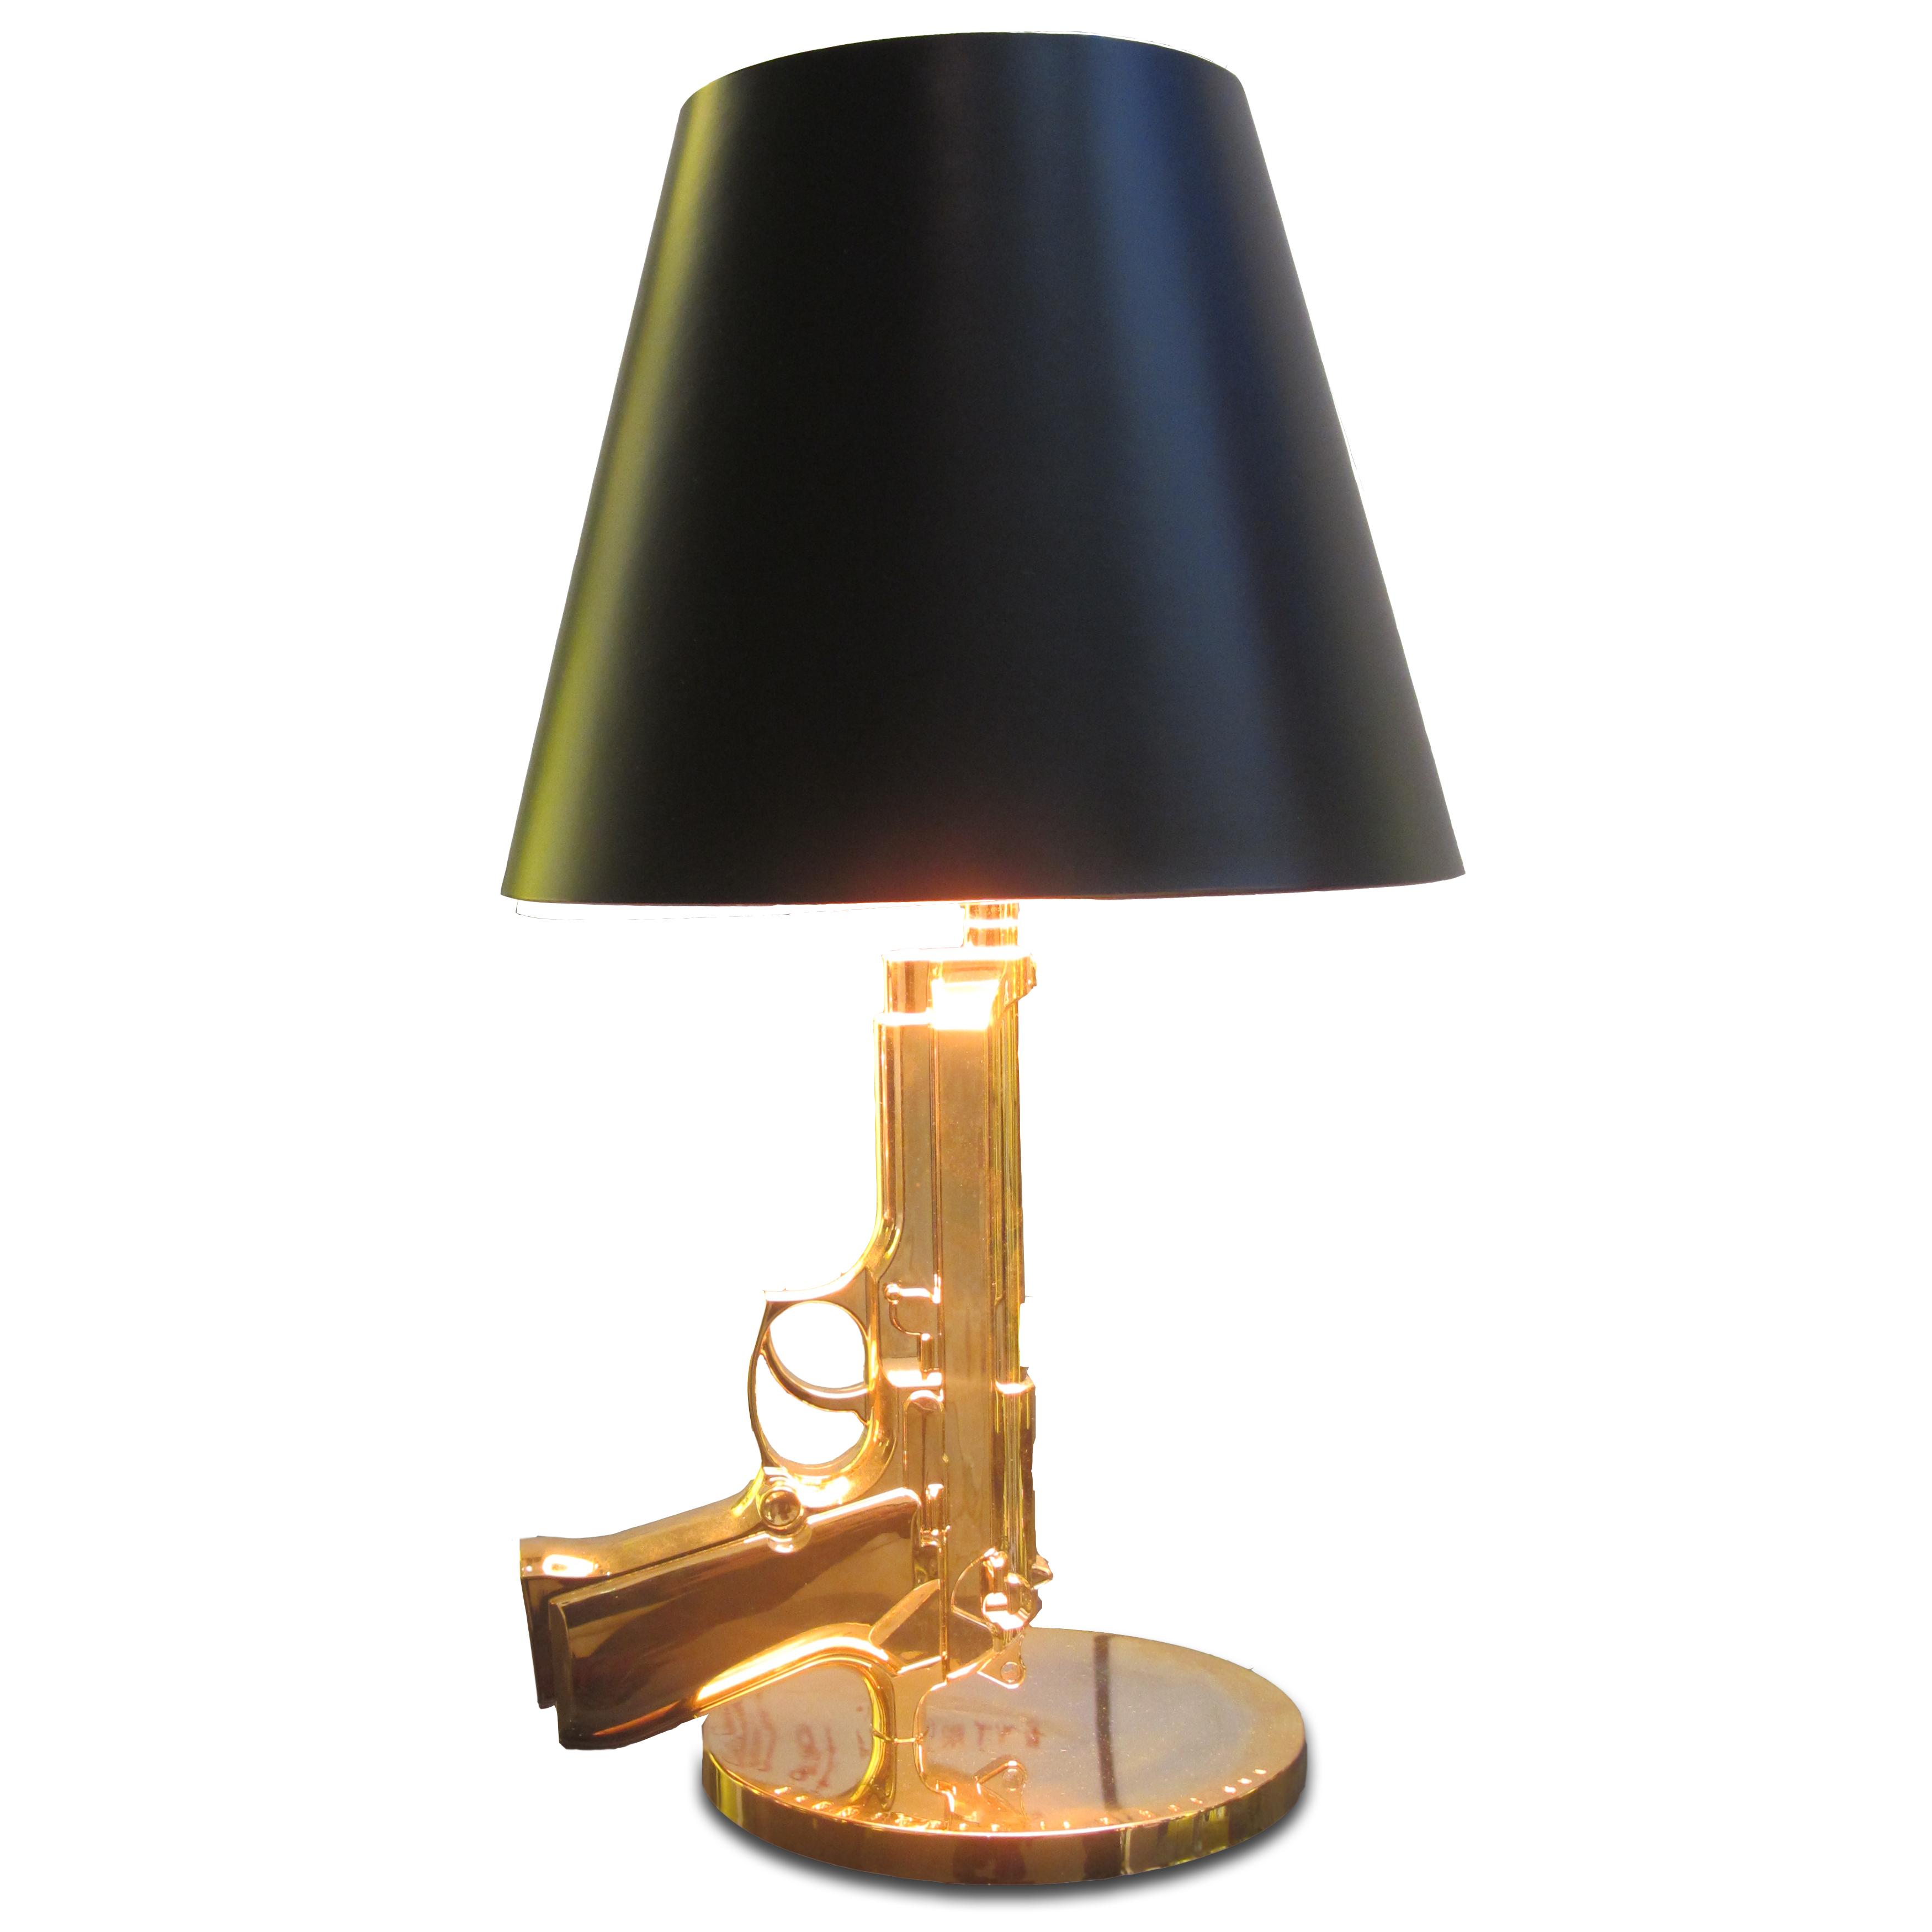 Filequot 12 italy lampada quotgunquot sfondo biancopng for Table lamp wikipedia